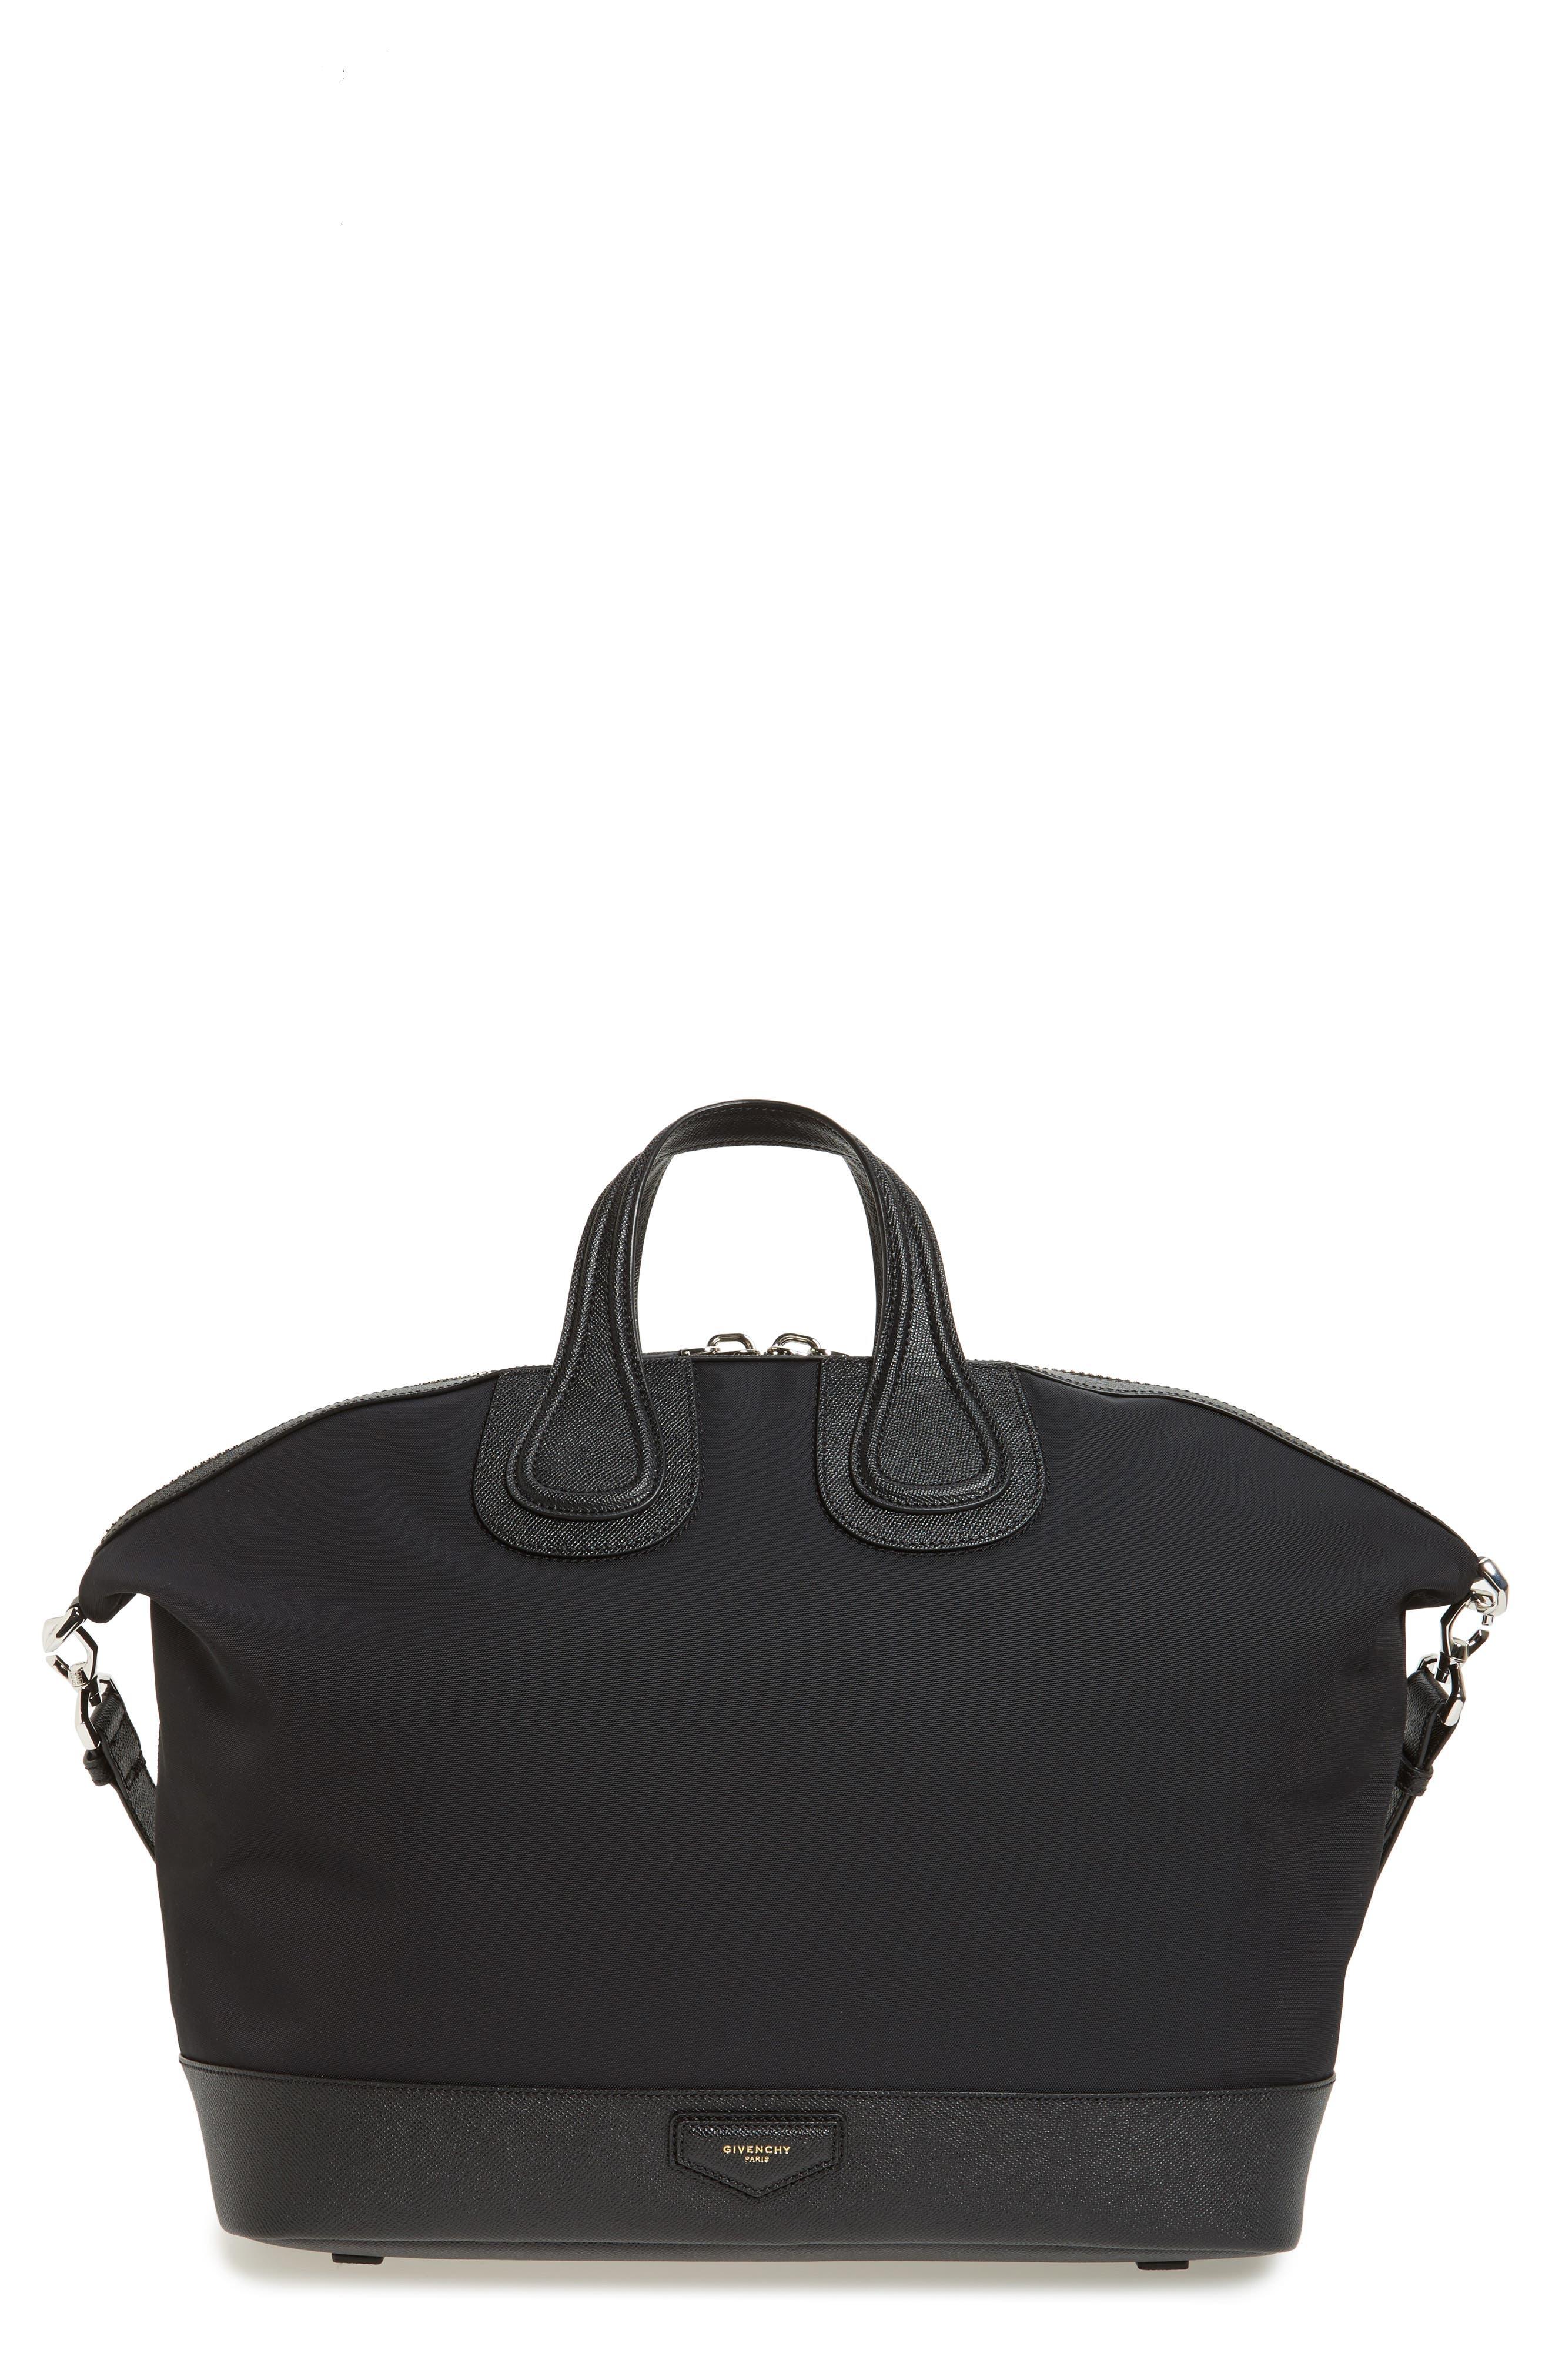 Nightingale Canvas Bag,                         Main,                         color,